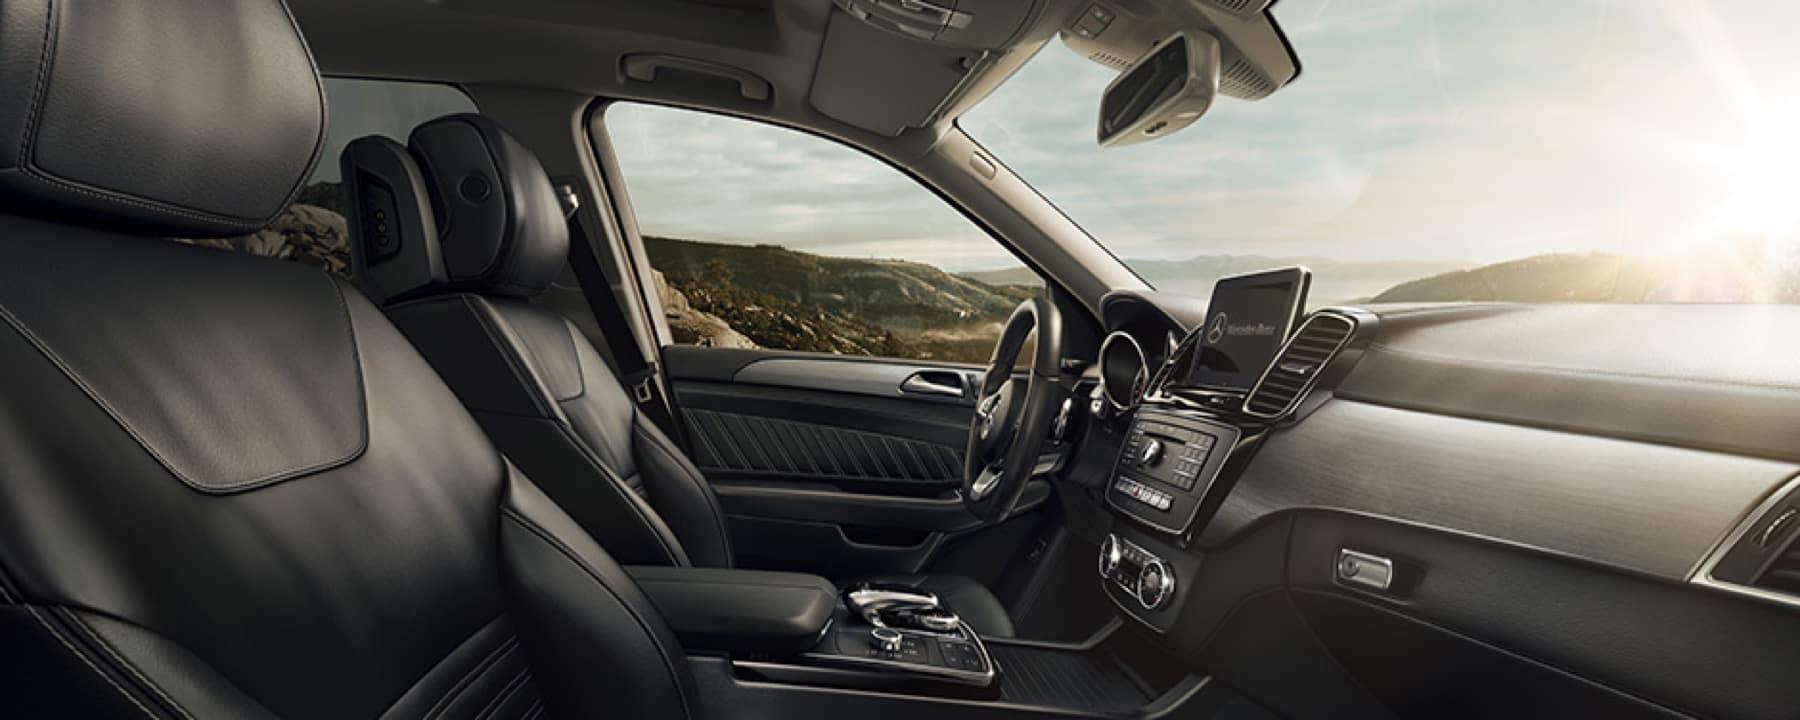 A Stellar Suv Choice The Mercedes Benz Gle Mercedes Benz Of Buffalo